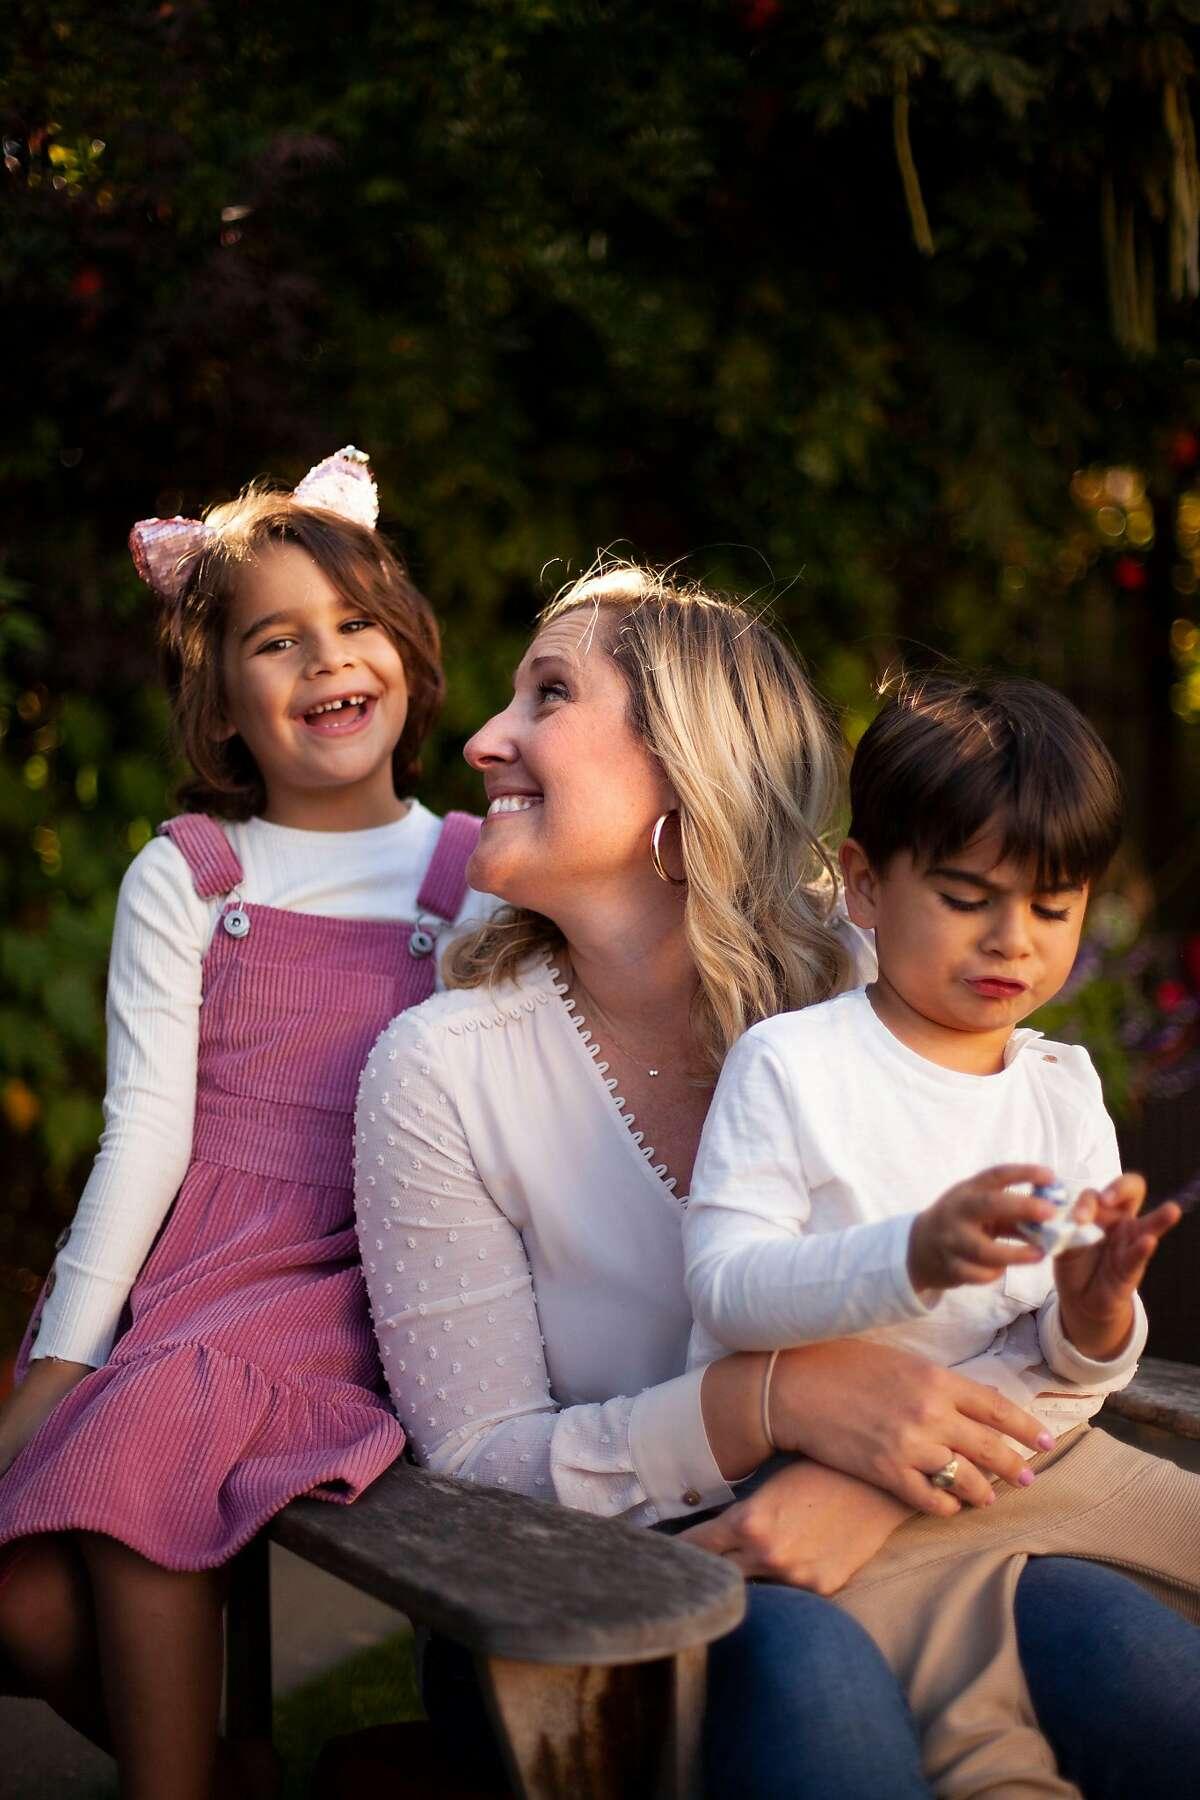 Sarahjane Sacchetti, CEO of Cleo, with her two children.